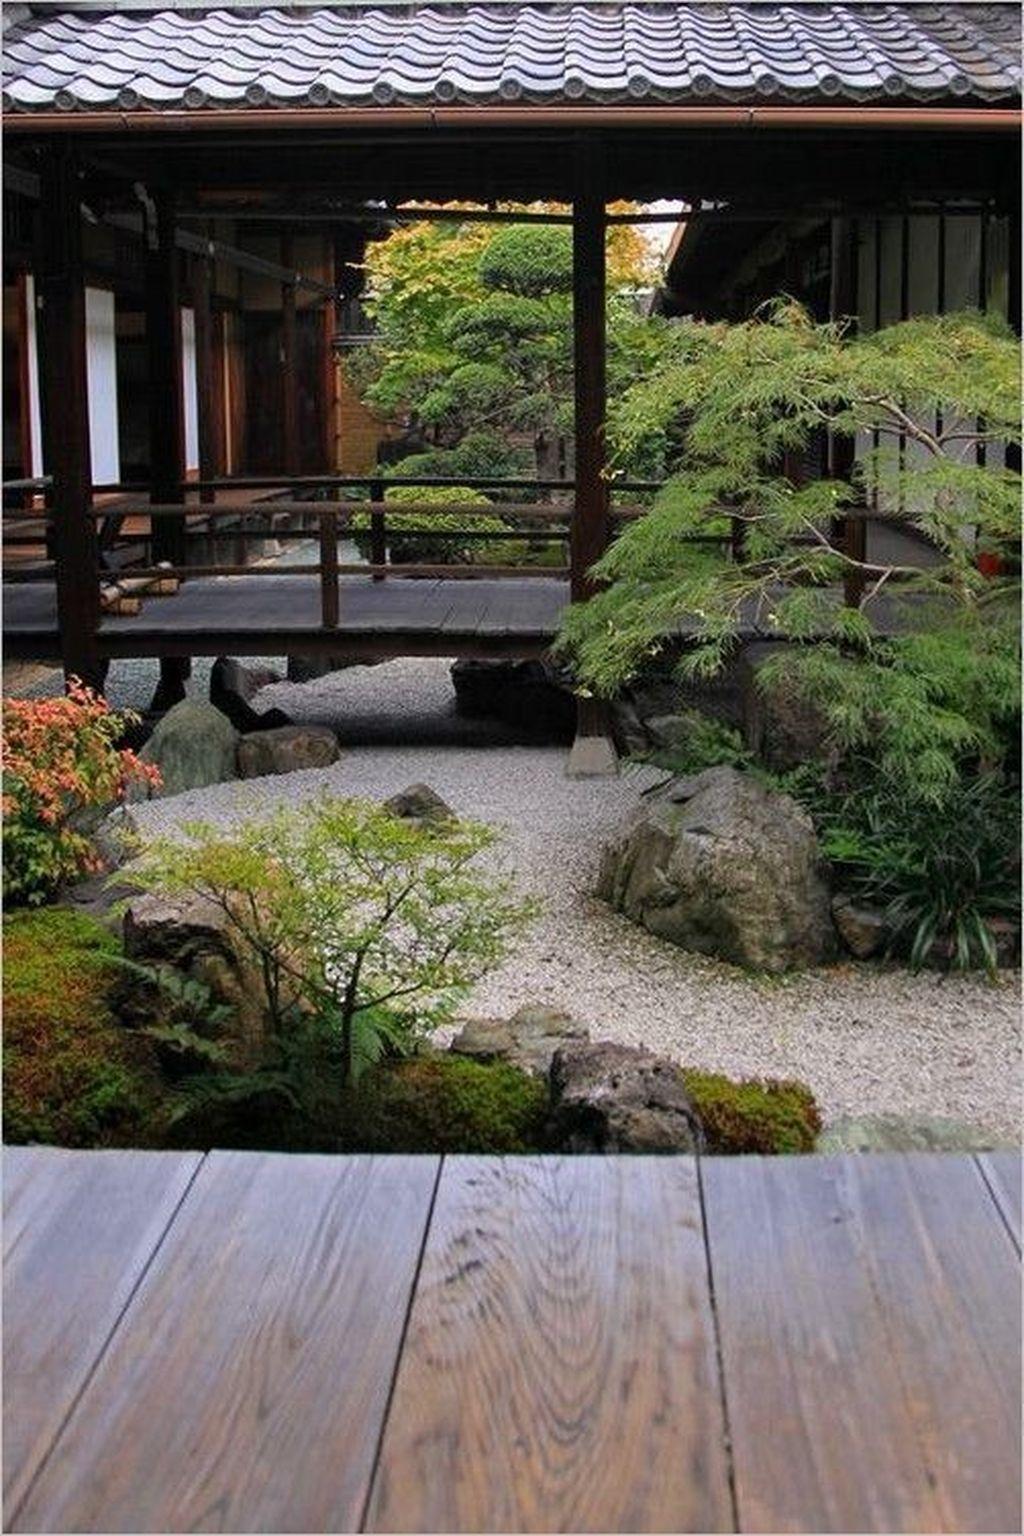 36 Vintage Zen Gardens Design Decor Ideas For Backyard ... avec Idee Jardin Zen